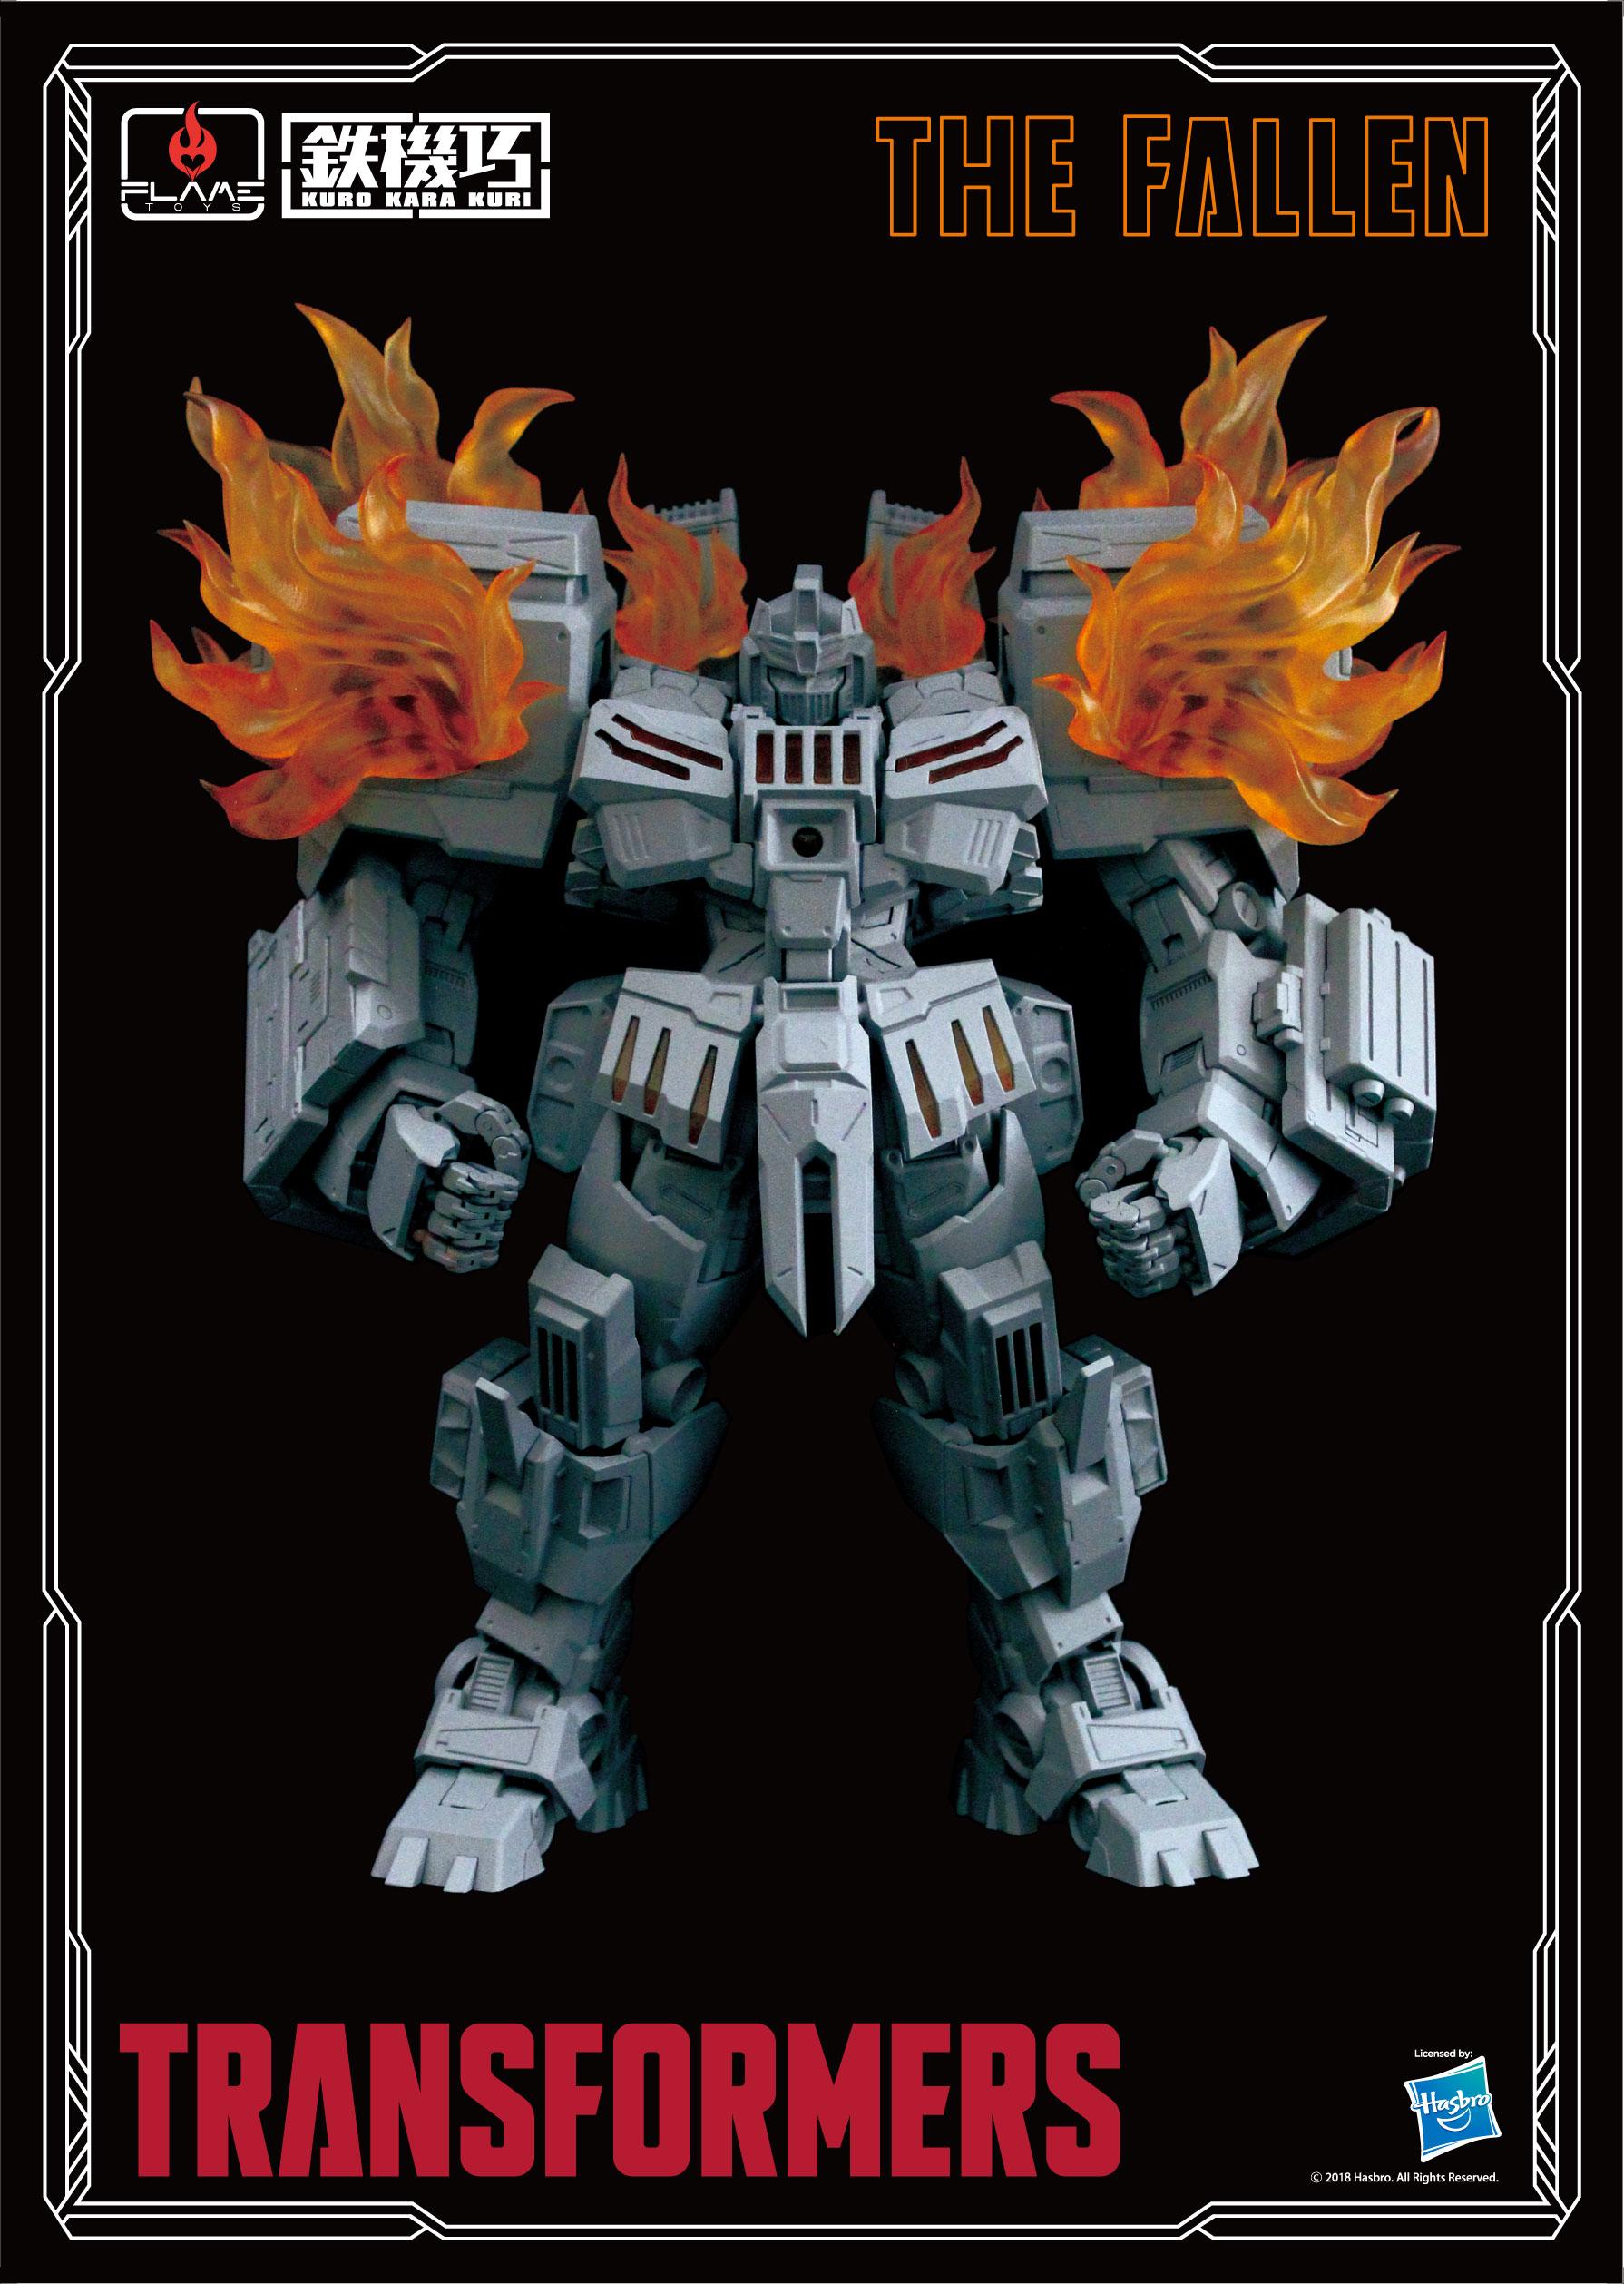 Godzilla 2005 Toys New Flame Toys Product...